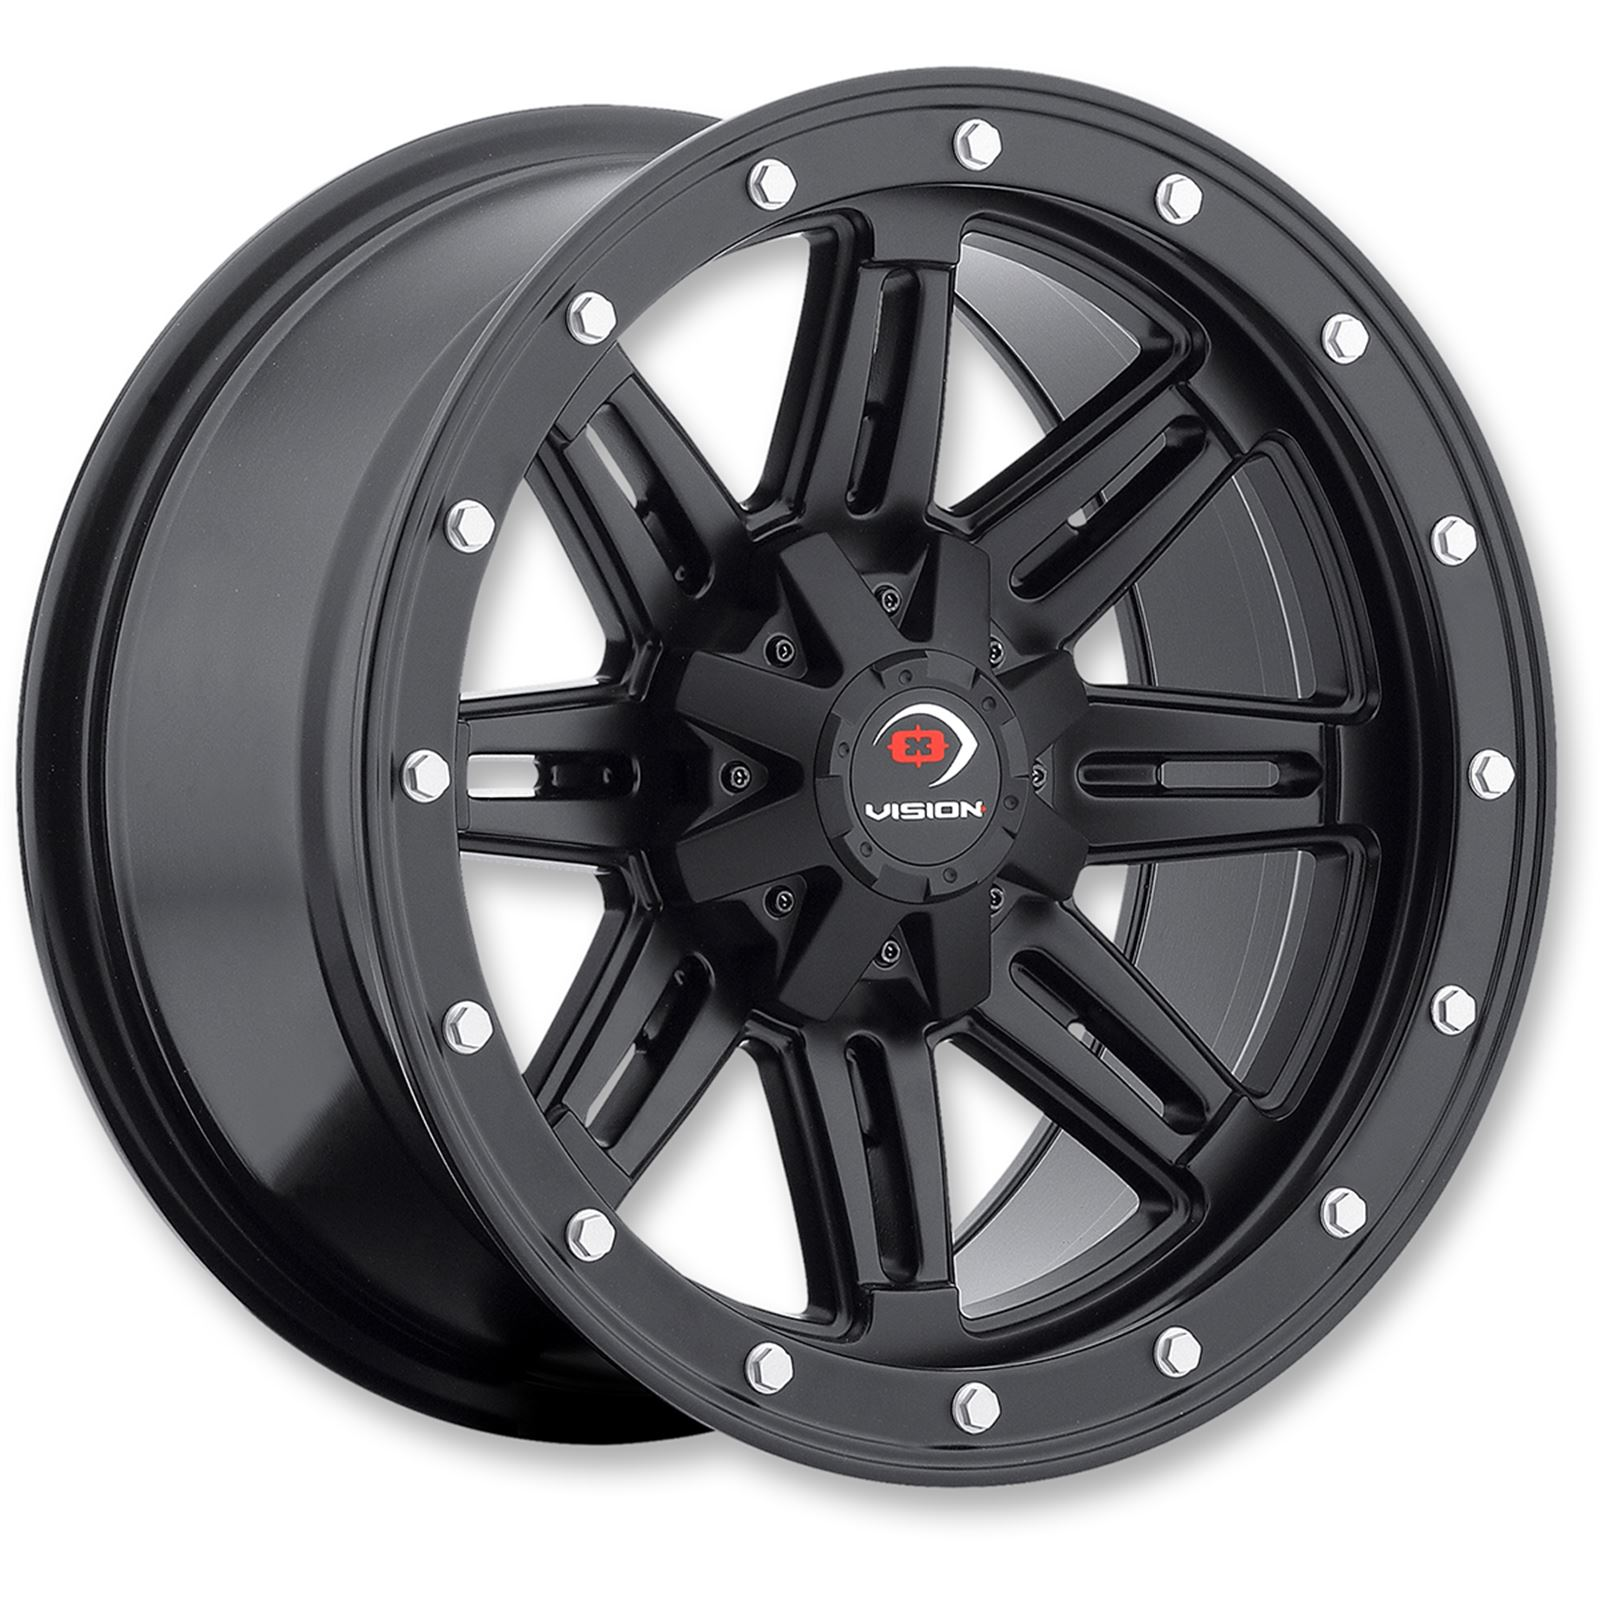 Vision Wheels Wheel - 550B - 12X8 4/156 4+4